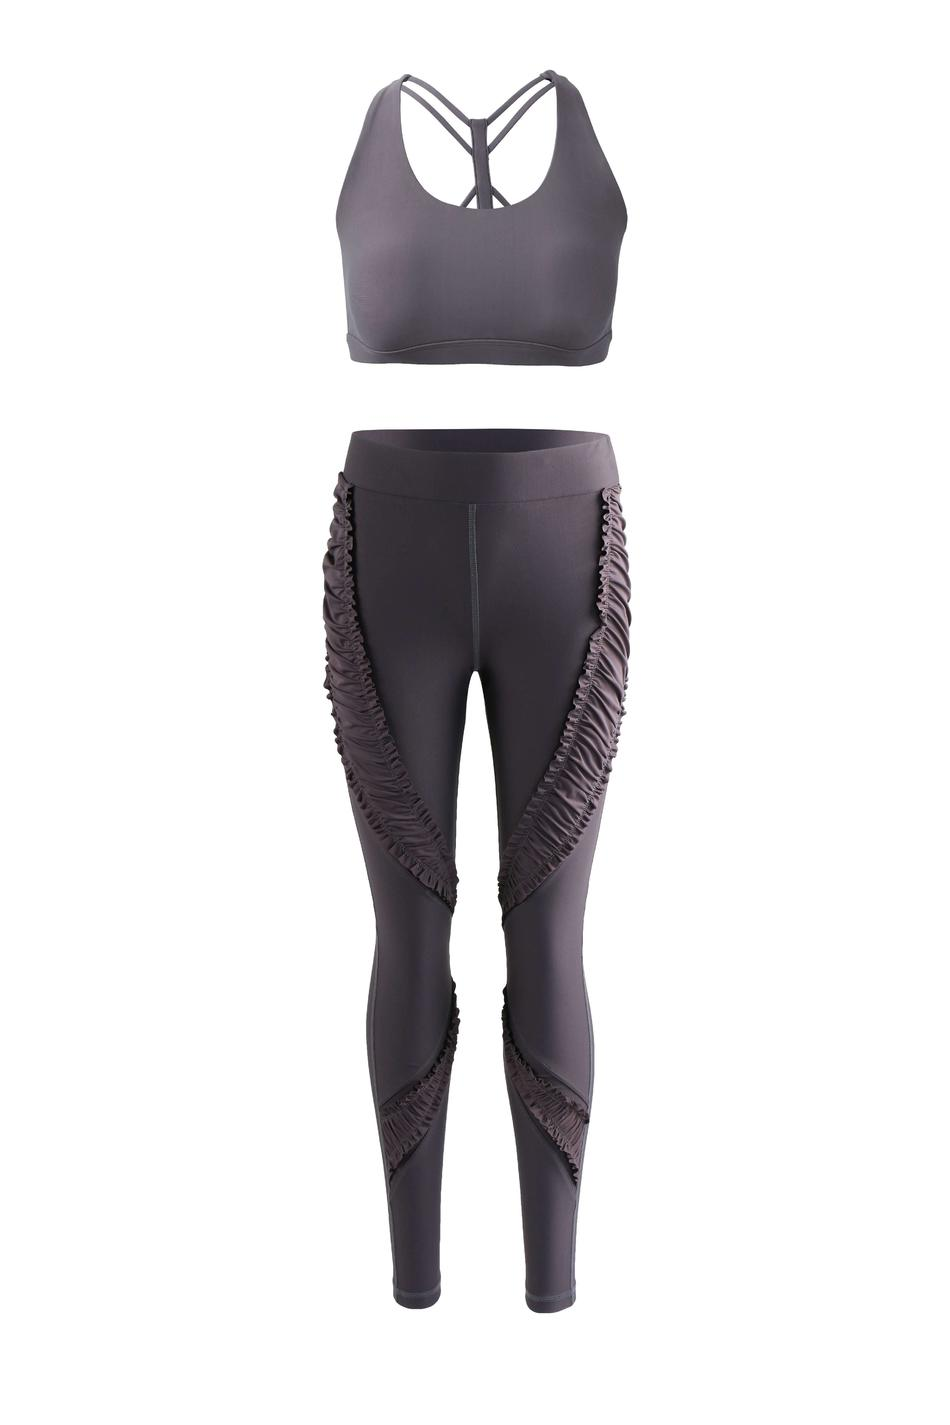 Women custom made logo band workout sports bra and leggings set